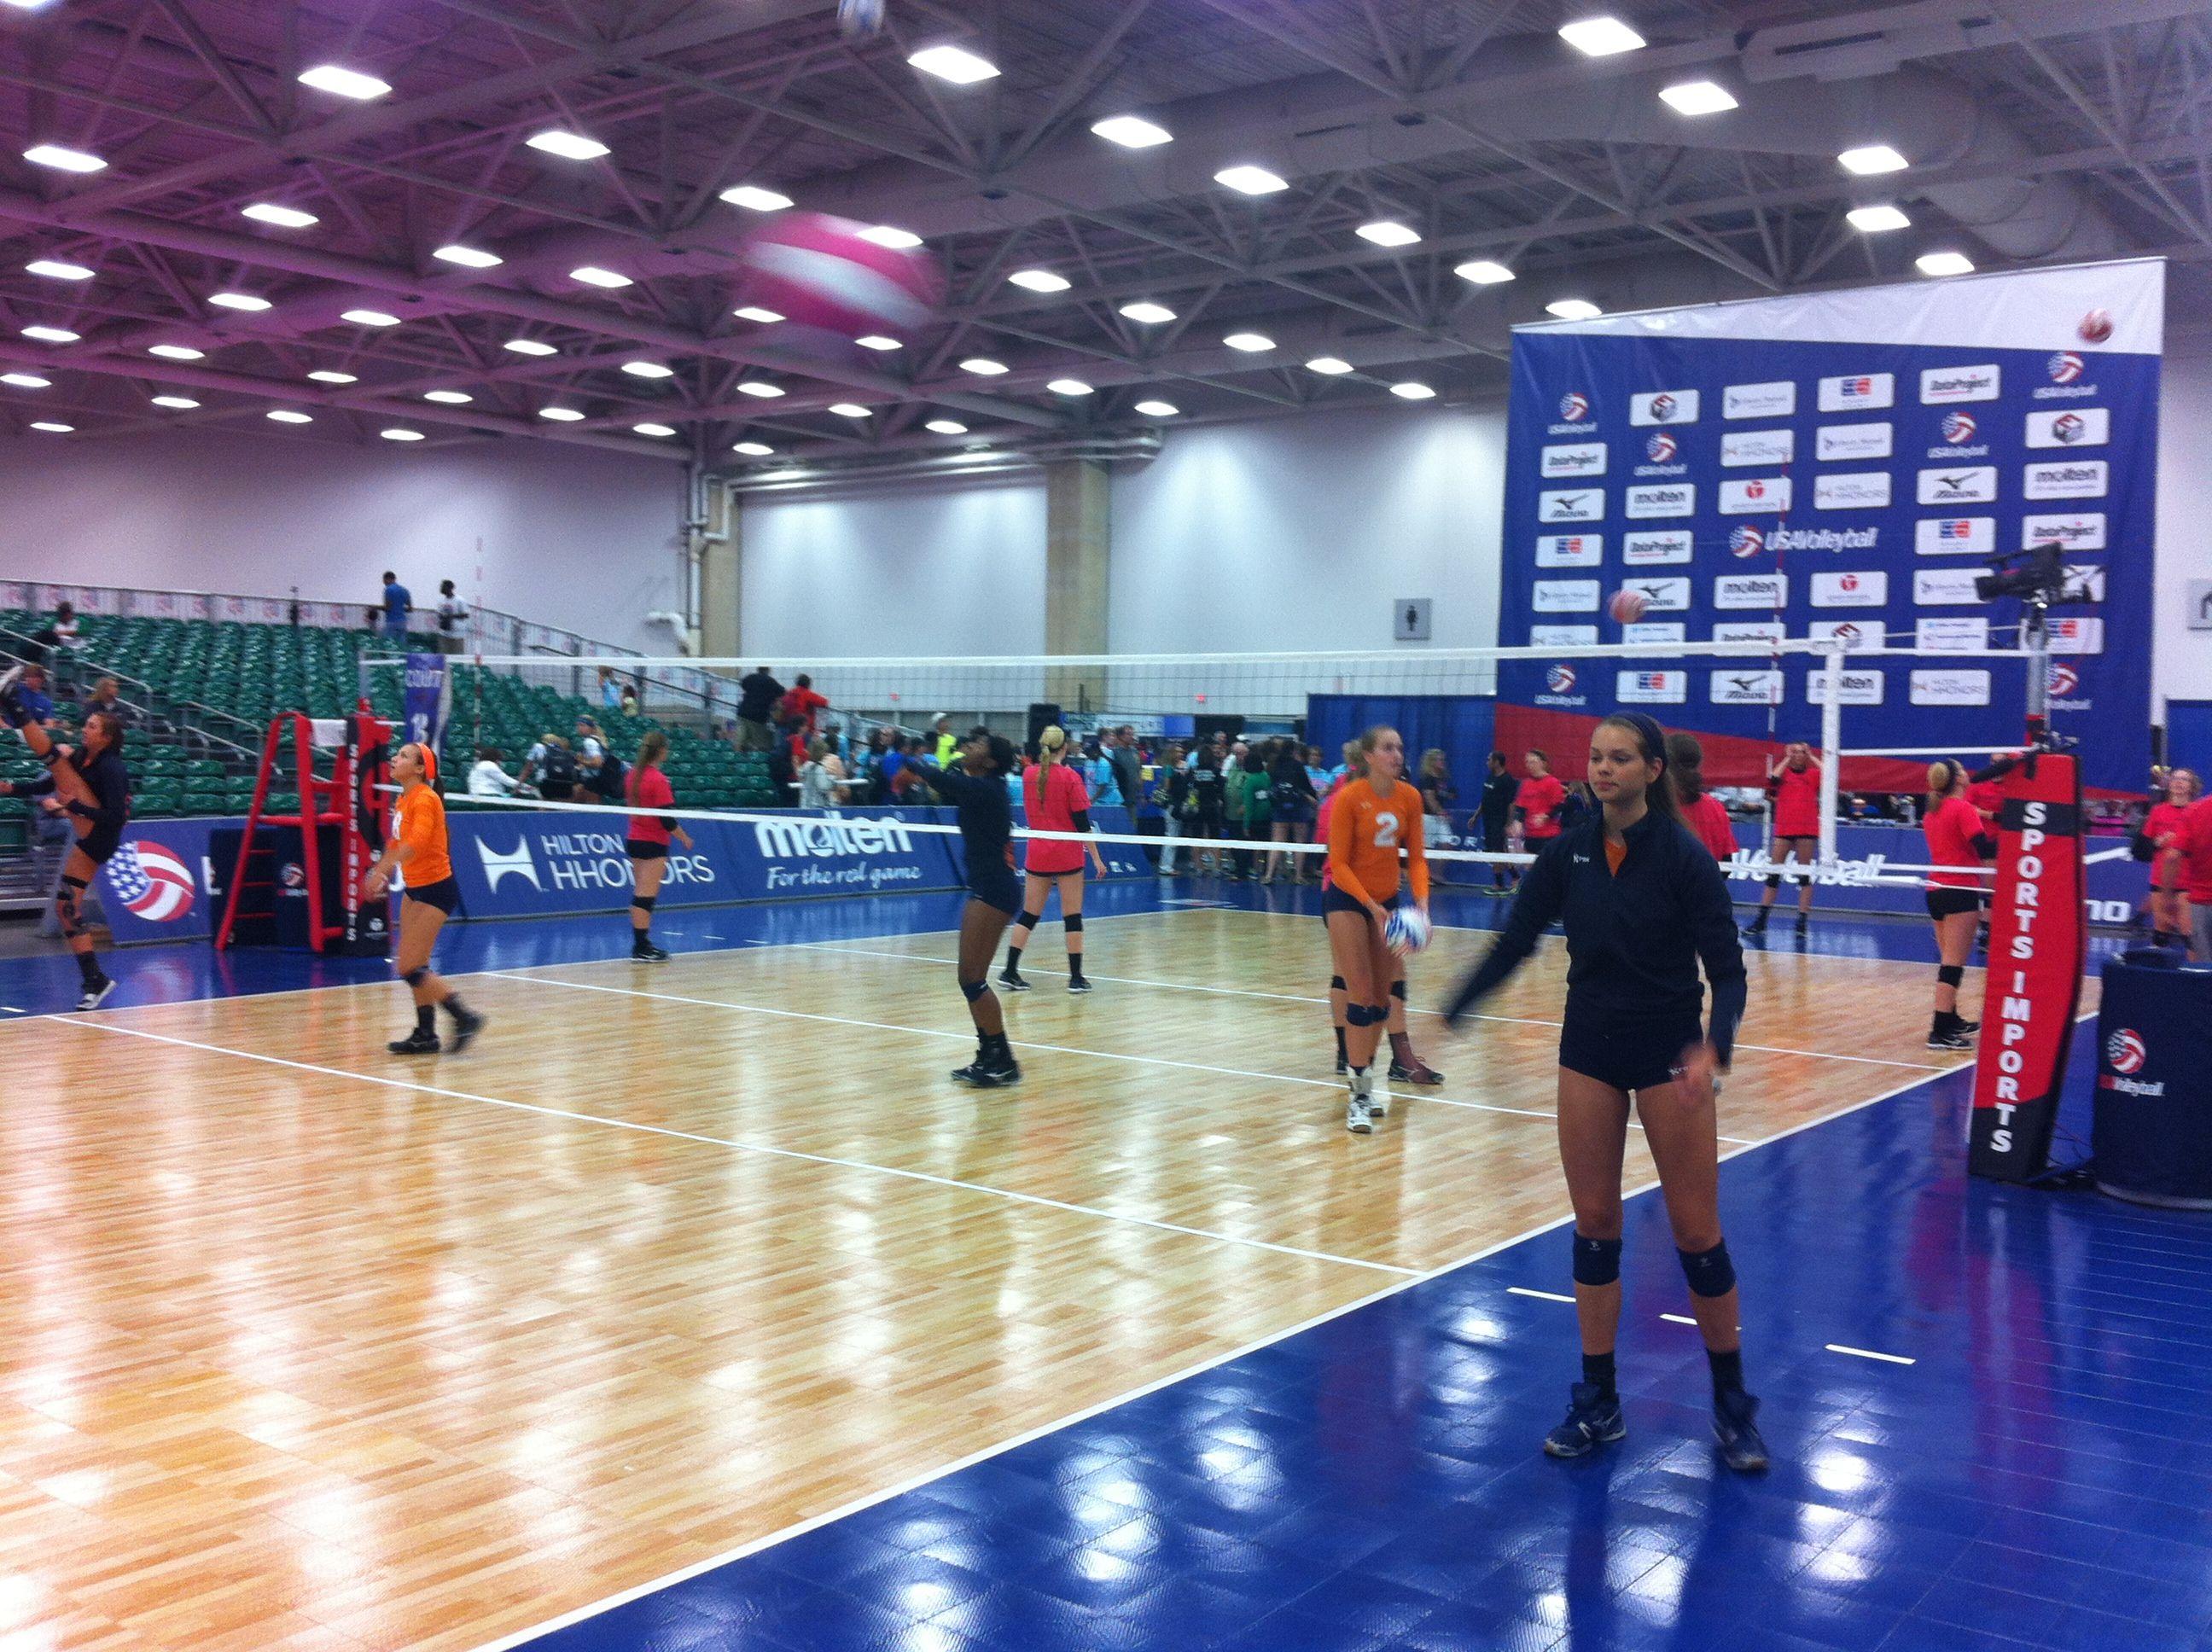 Usa Volleyball Championship Court Sports Imports Volleyball Equipment Volleyball Volleyball Net Usa Volleyball